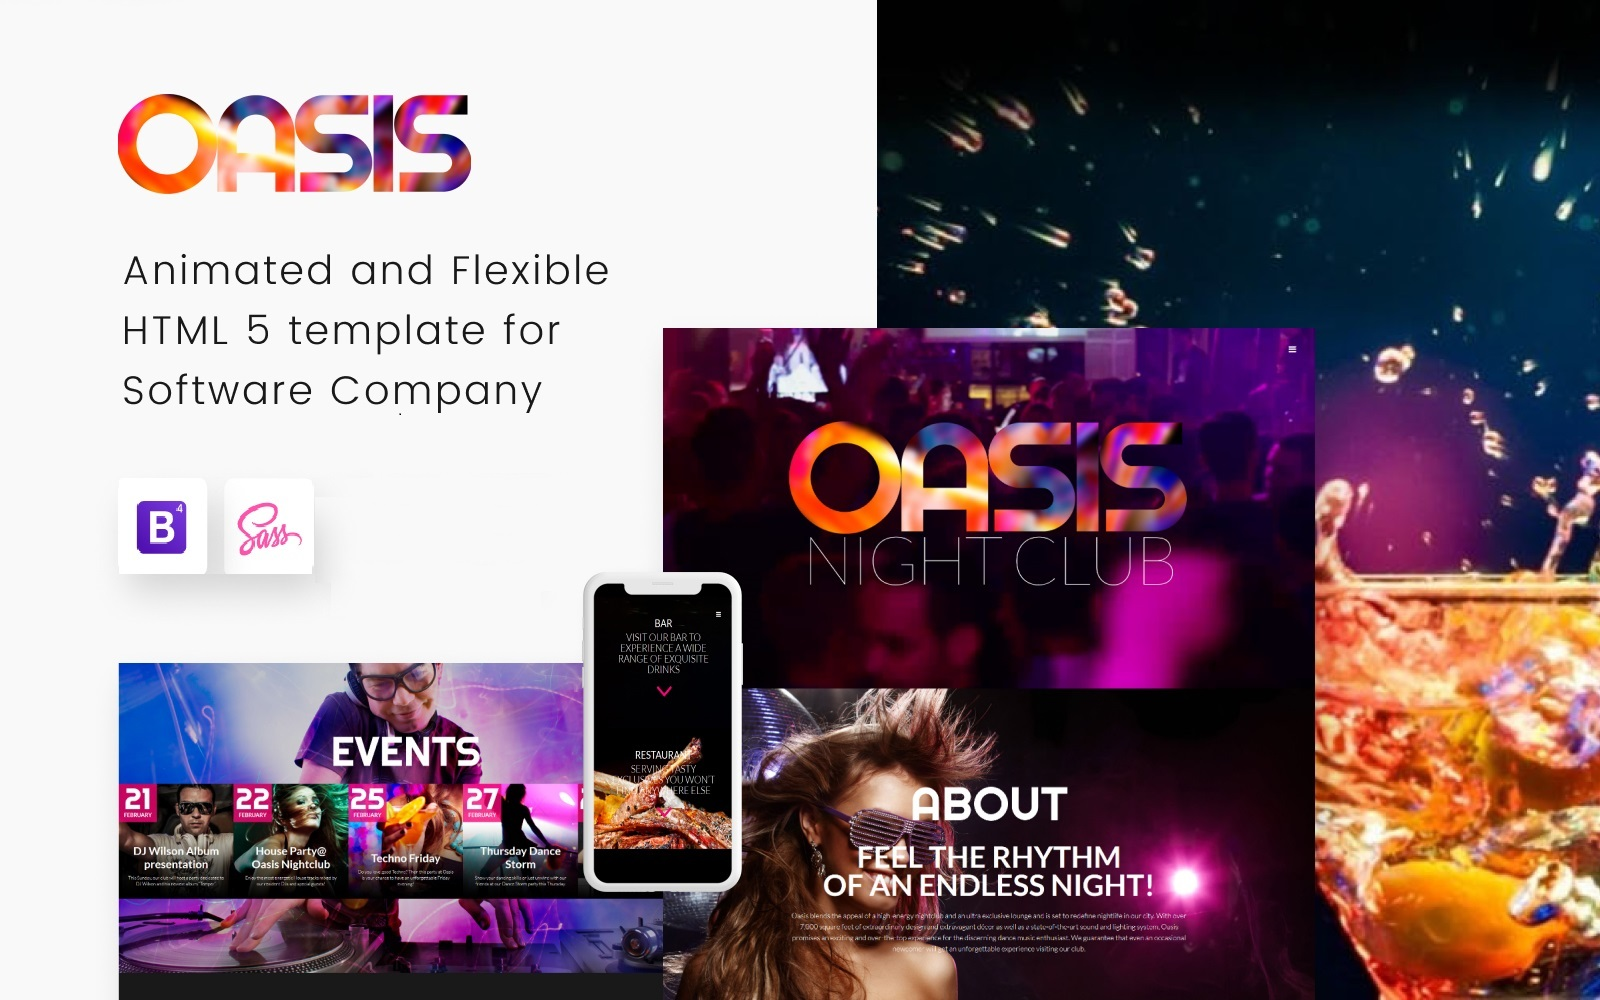 Reszponzív OASIS - Night Club Responsive Weboldal sablon 53412